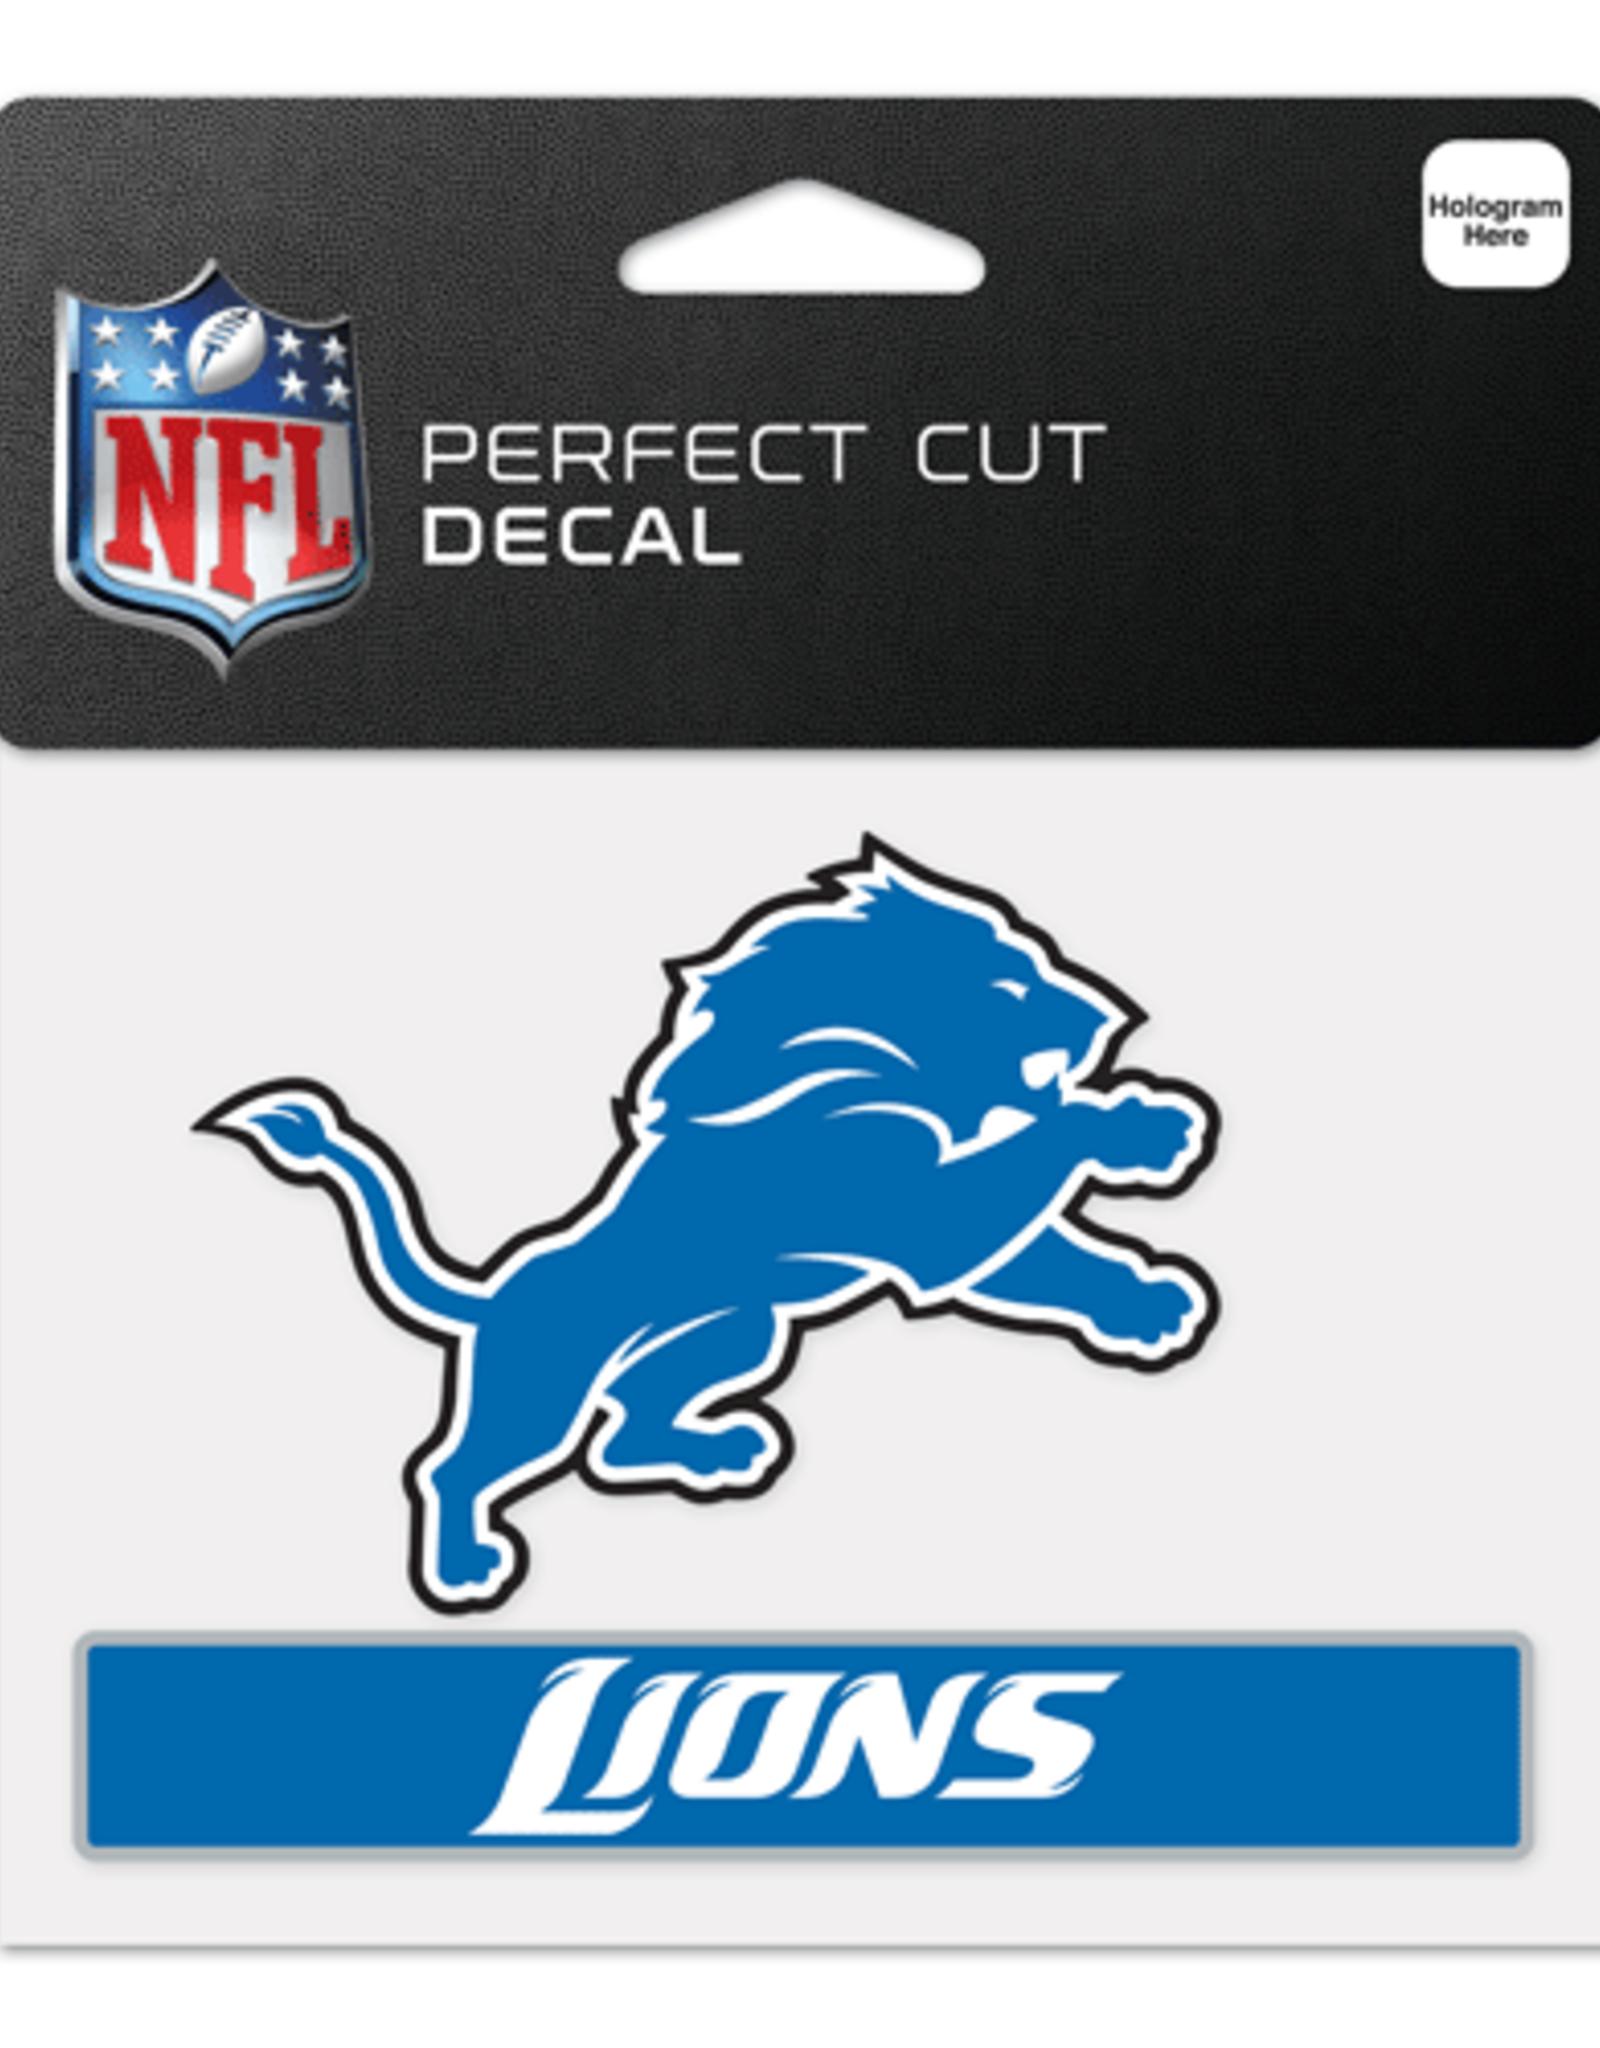 "WINCRAFT Detriot Lions 4.5"" x 5.75"" Perfect Cut Decals"